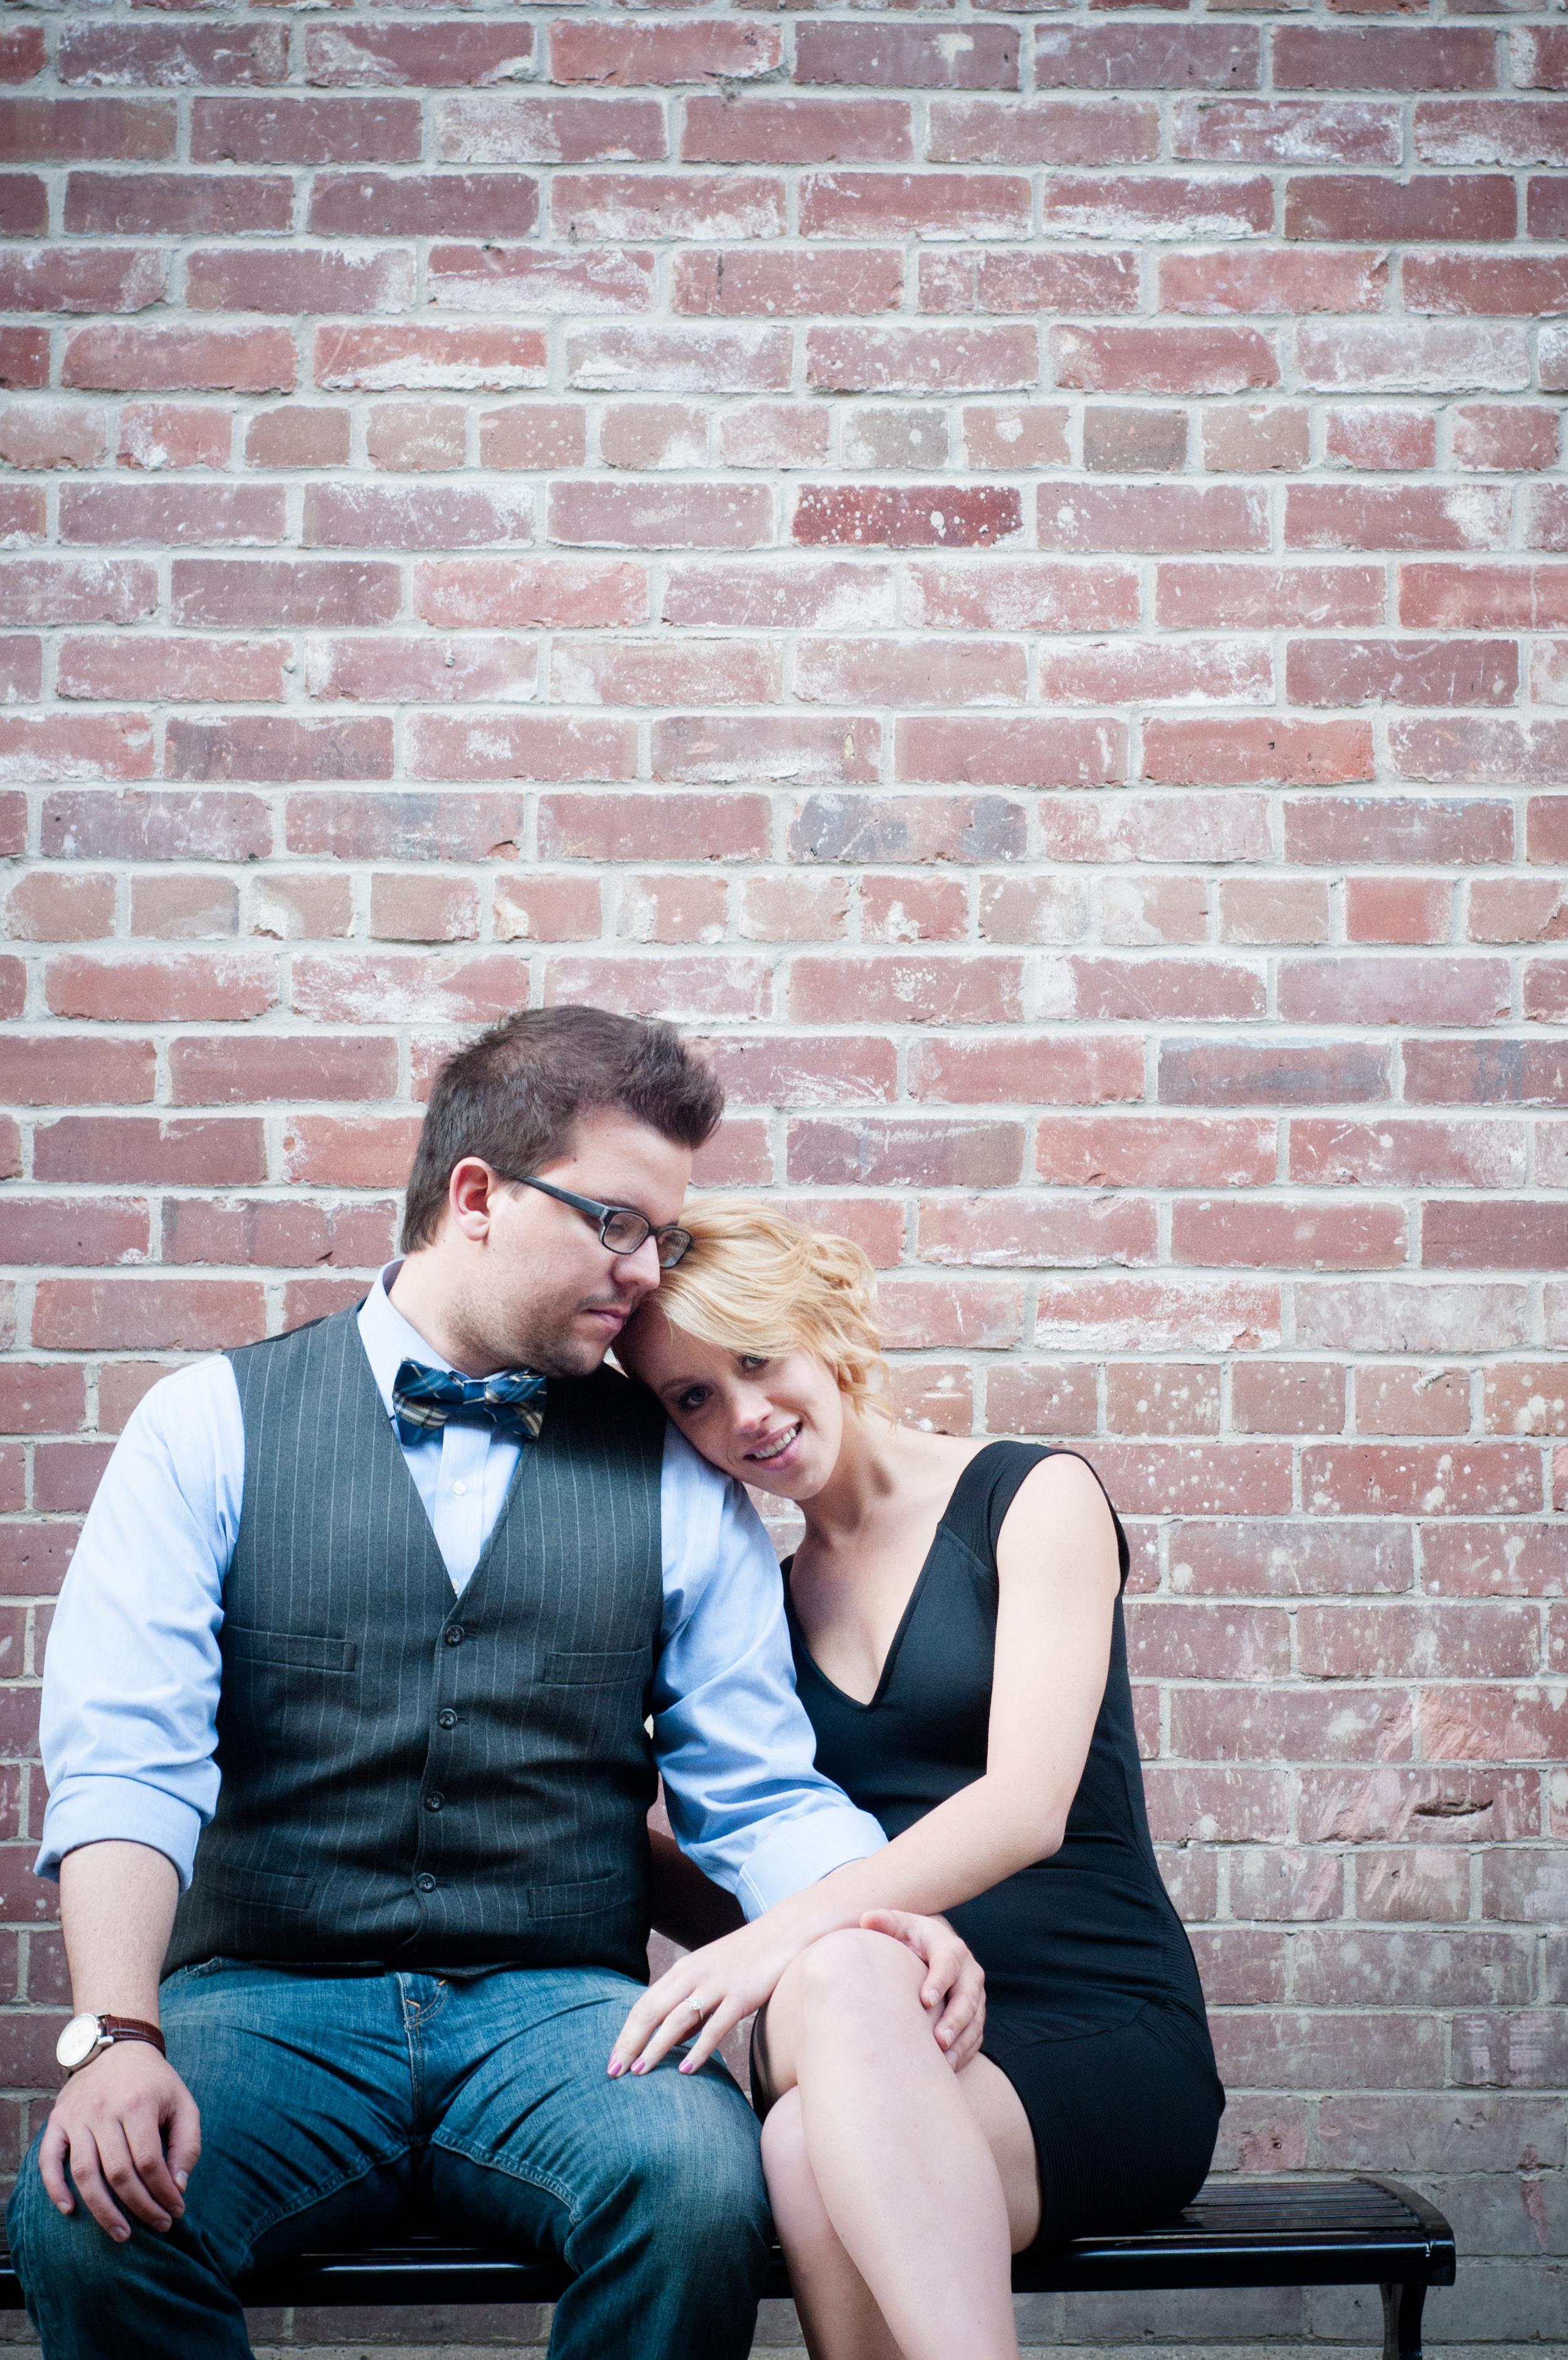 Natalee & Chris Engagement Session 2013 TNP-552.jpg